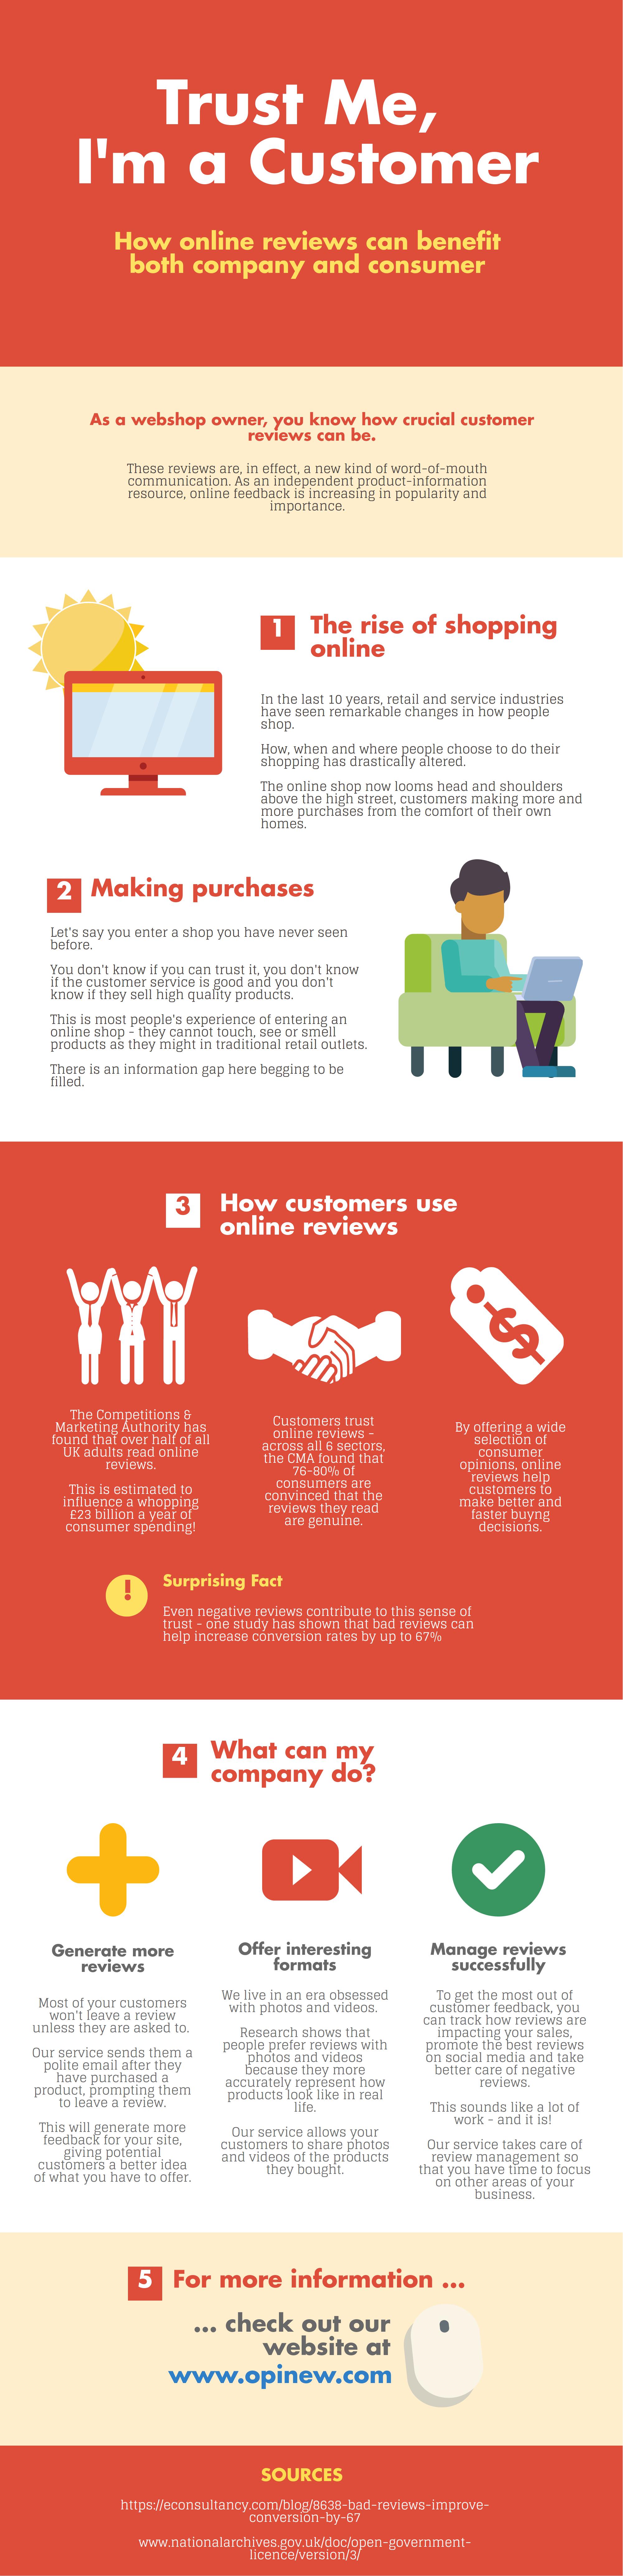 Infographic-Trust-Me-Im-a-Customr